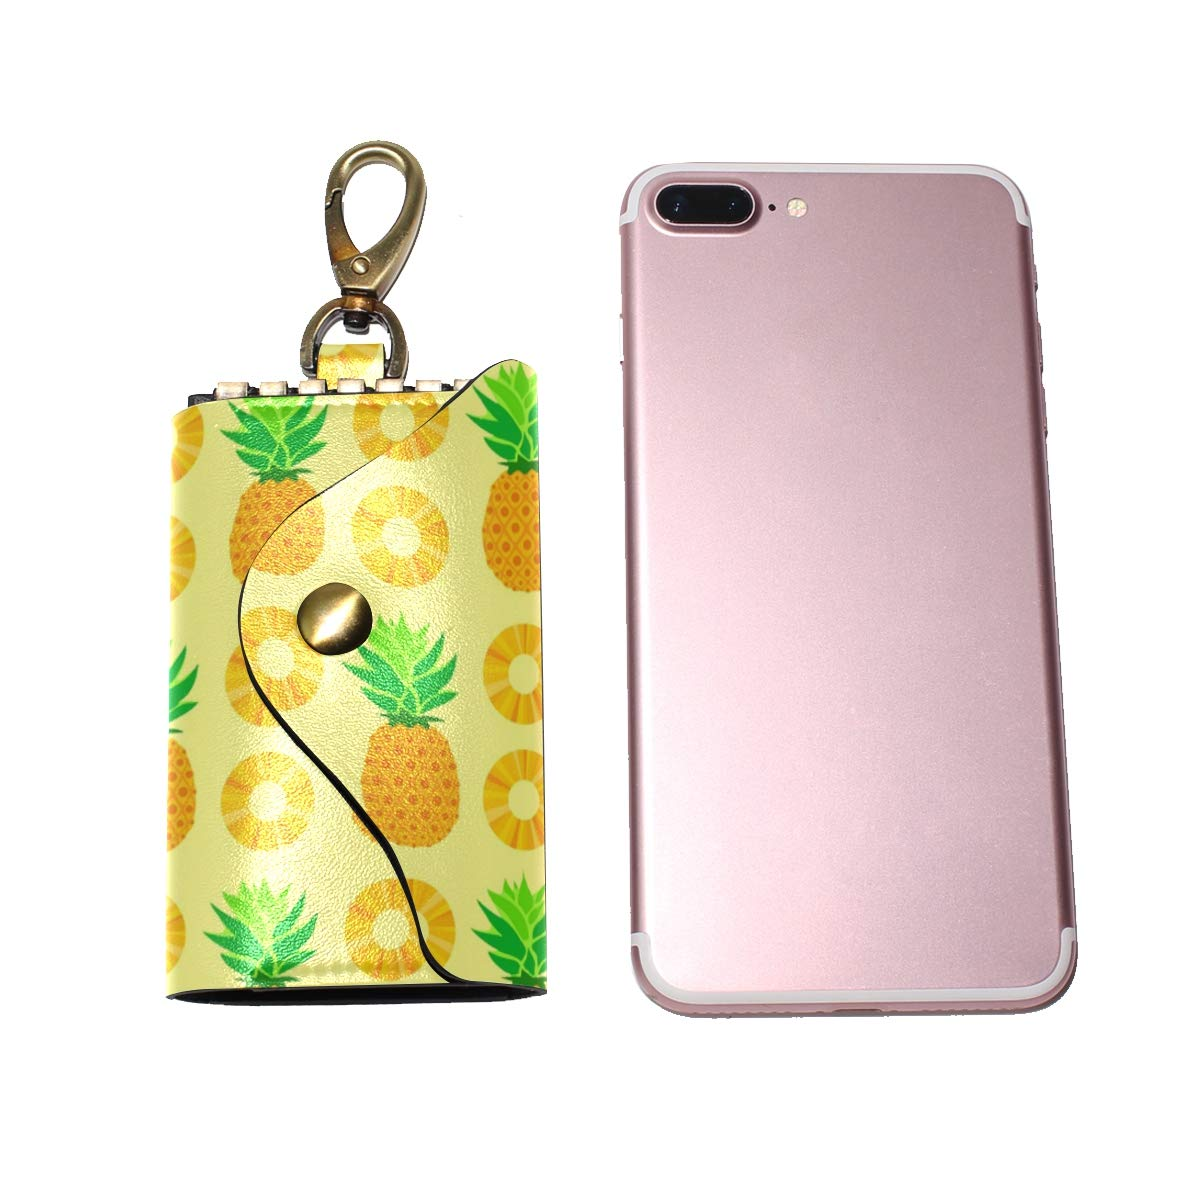 KEAKIA Yellow Pineapple Pattern Leather Key Case Wallets Tri-fold Key Holder Keychains with 6 Hooks 2 Slot Snap Closure for Men Women